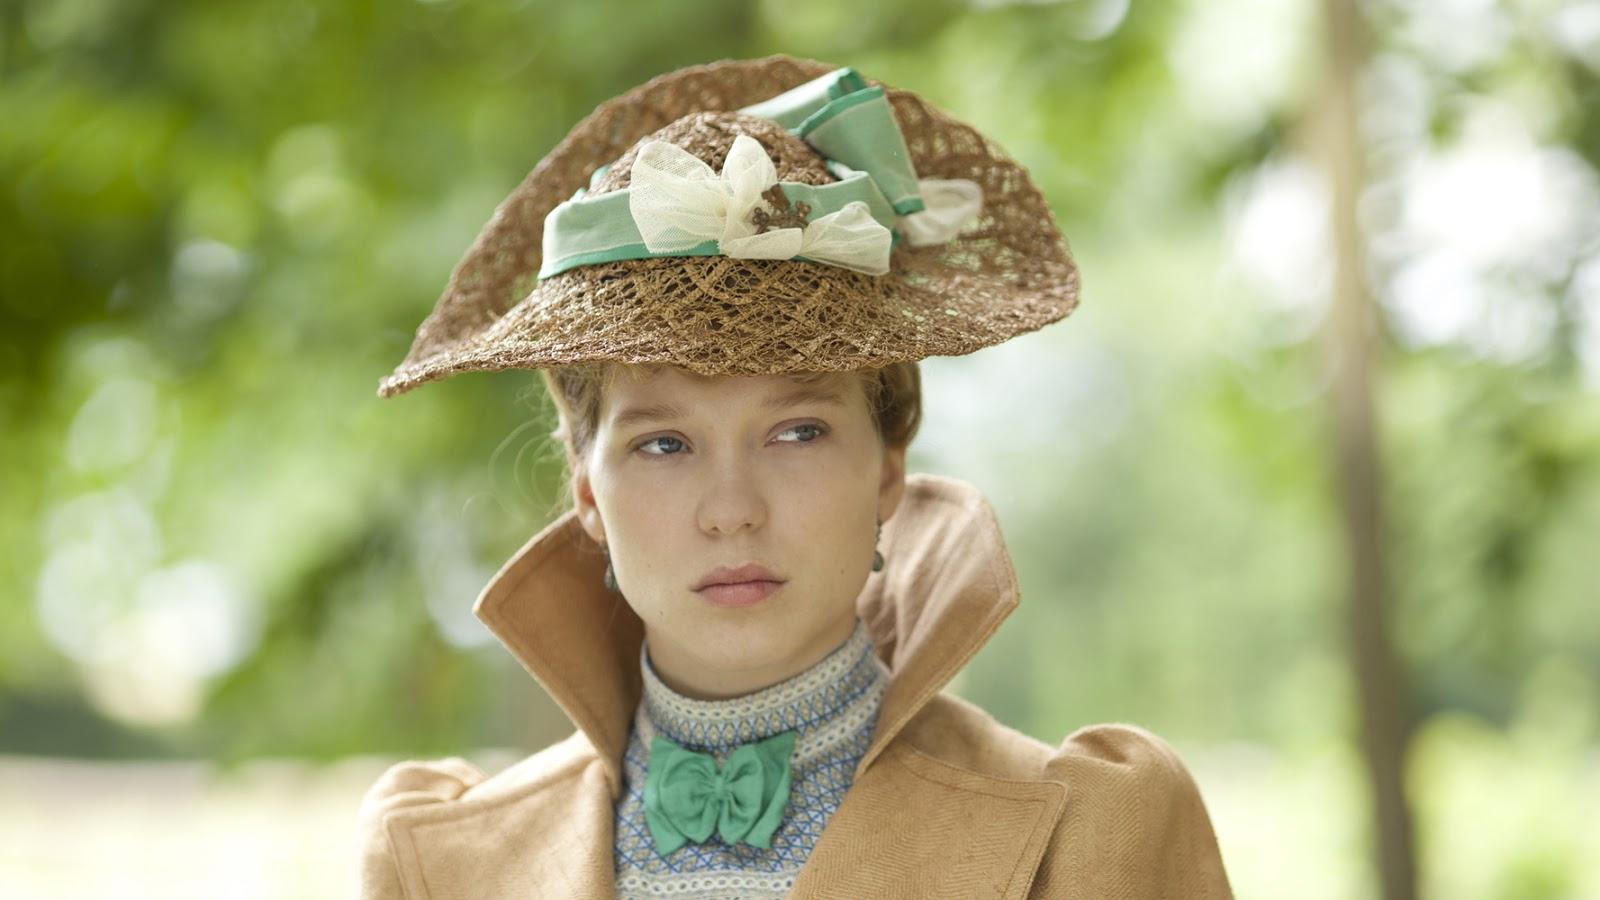 filmy kostiumowe  journal d u0026 39 une femme de chambre  2015